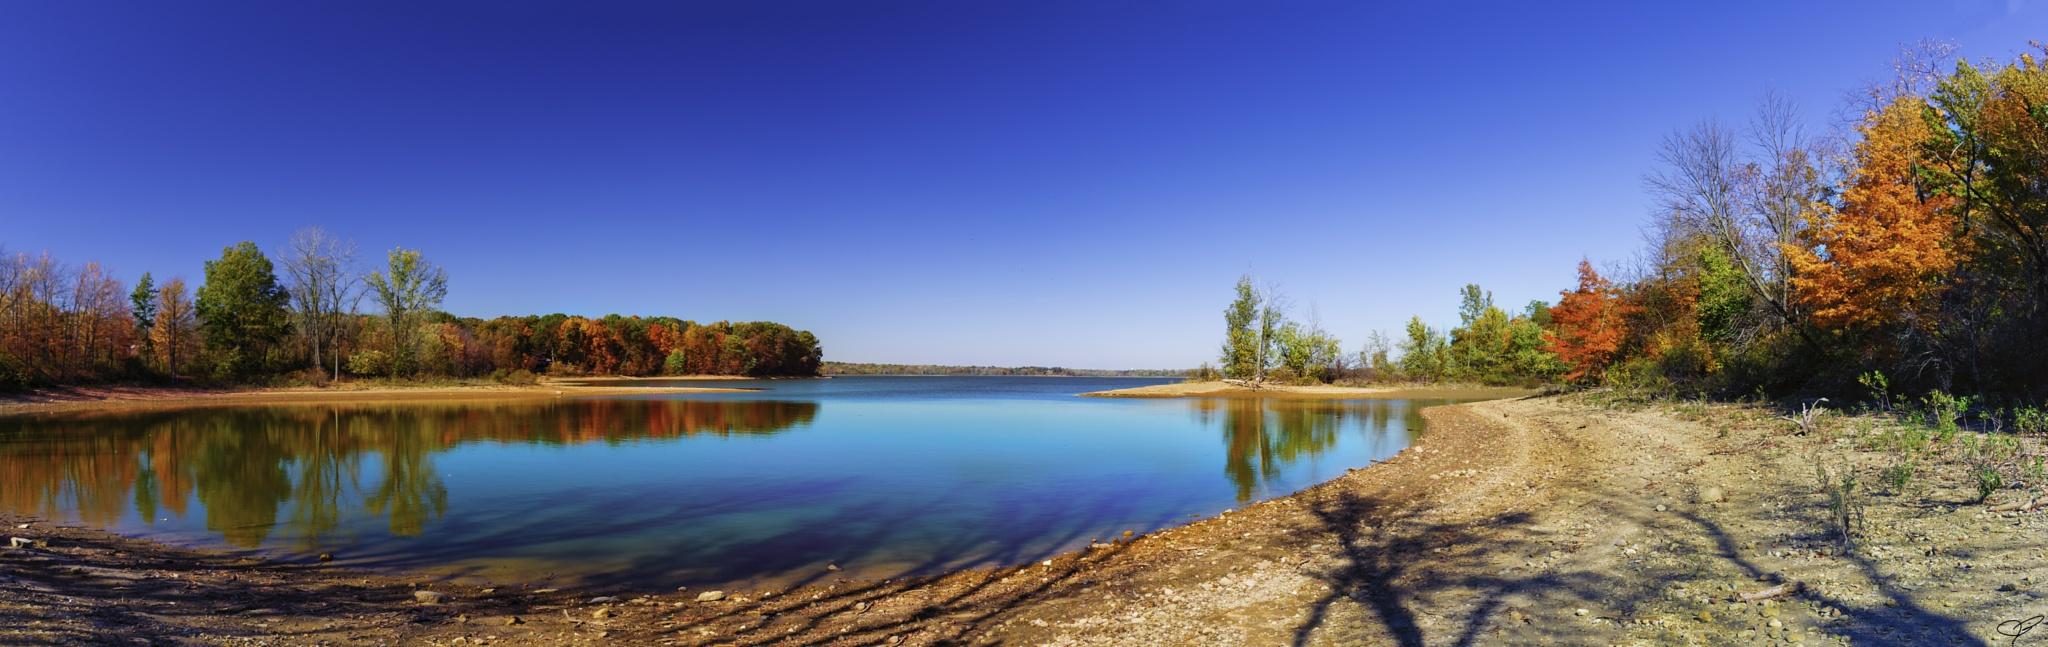 Autumn on the lake by JohnBrake